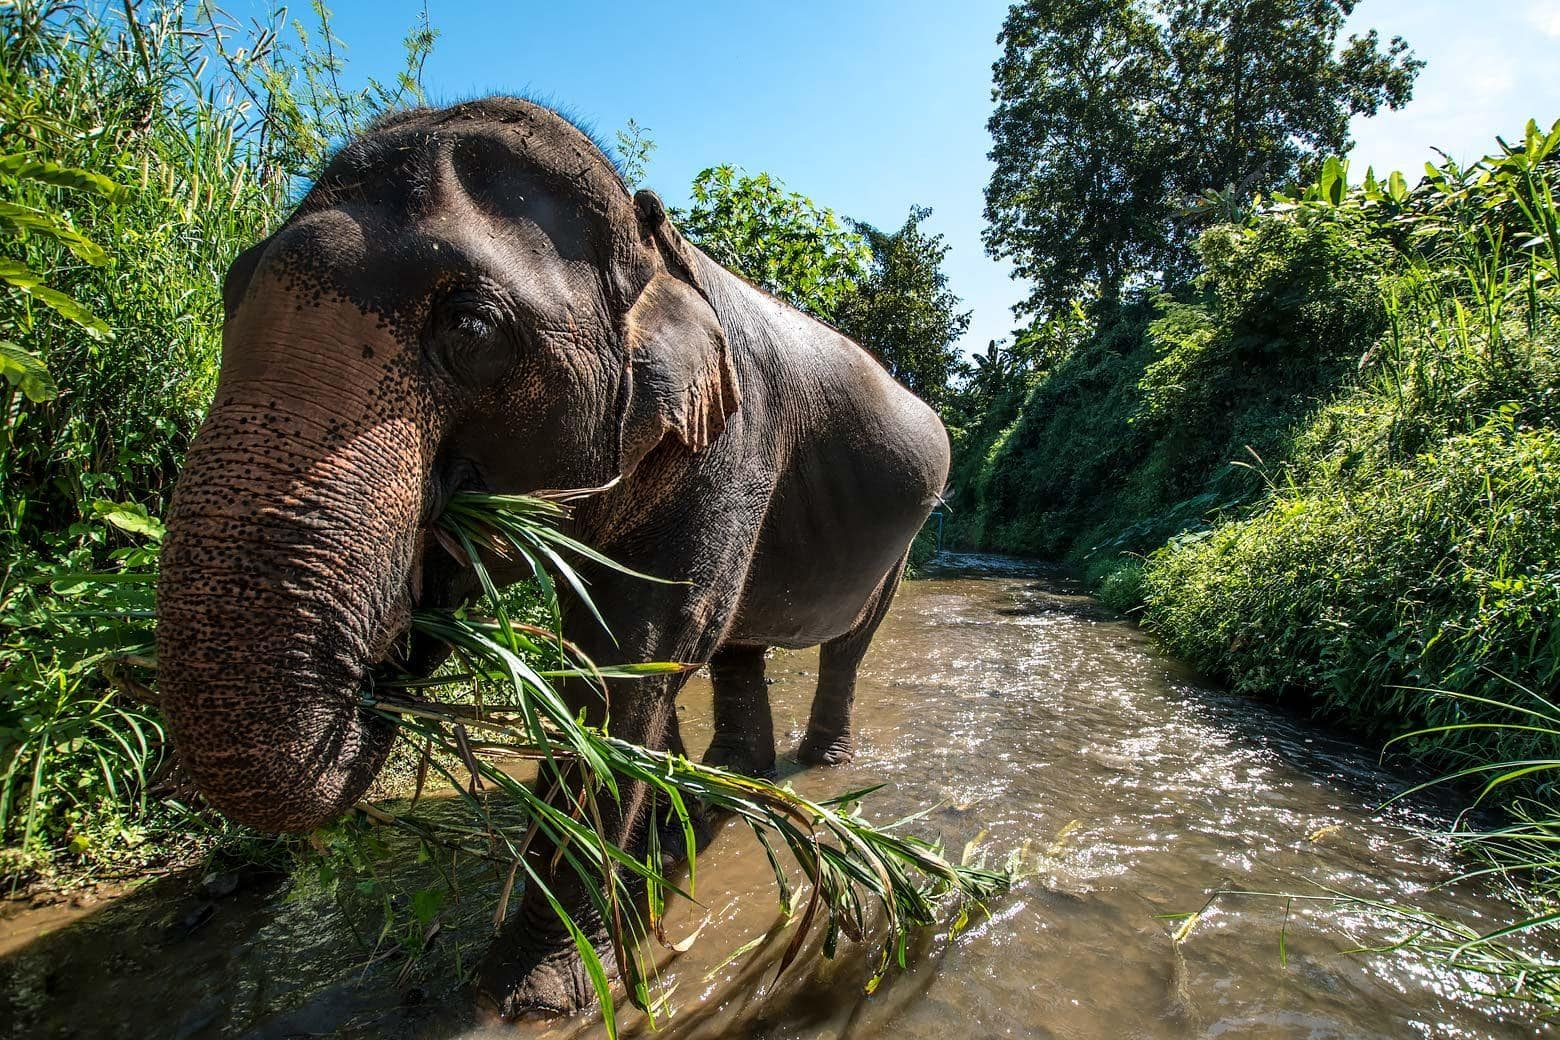 Elephant part of the Elephant Nature's Park project - Elephant Trails